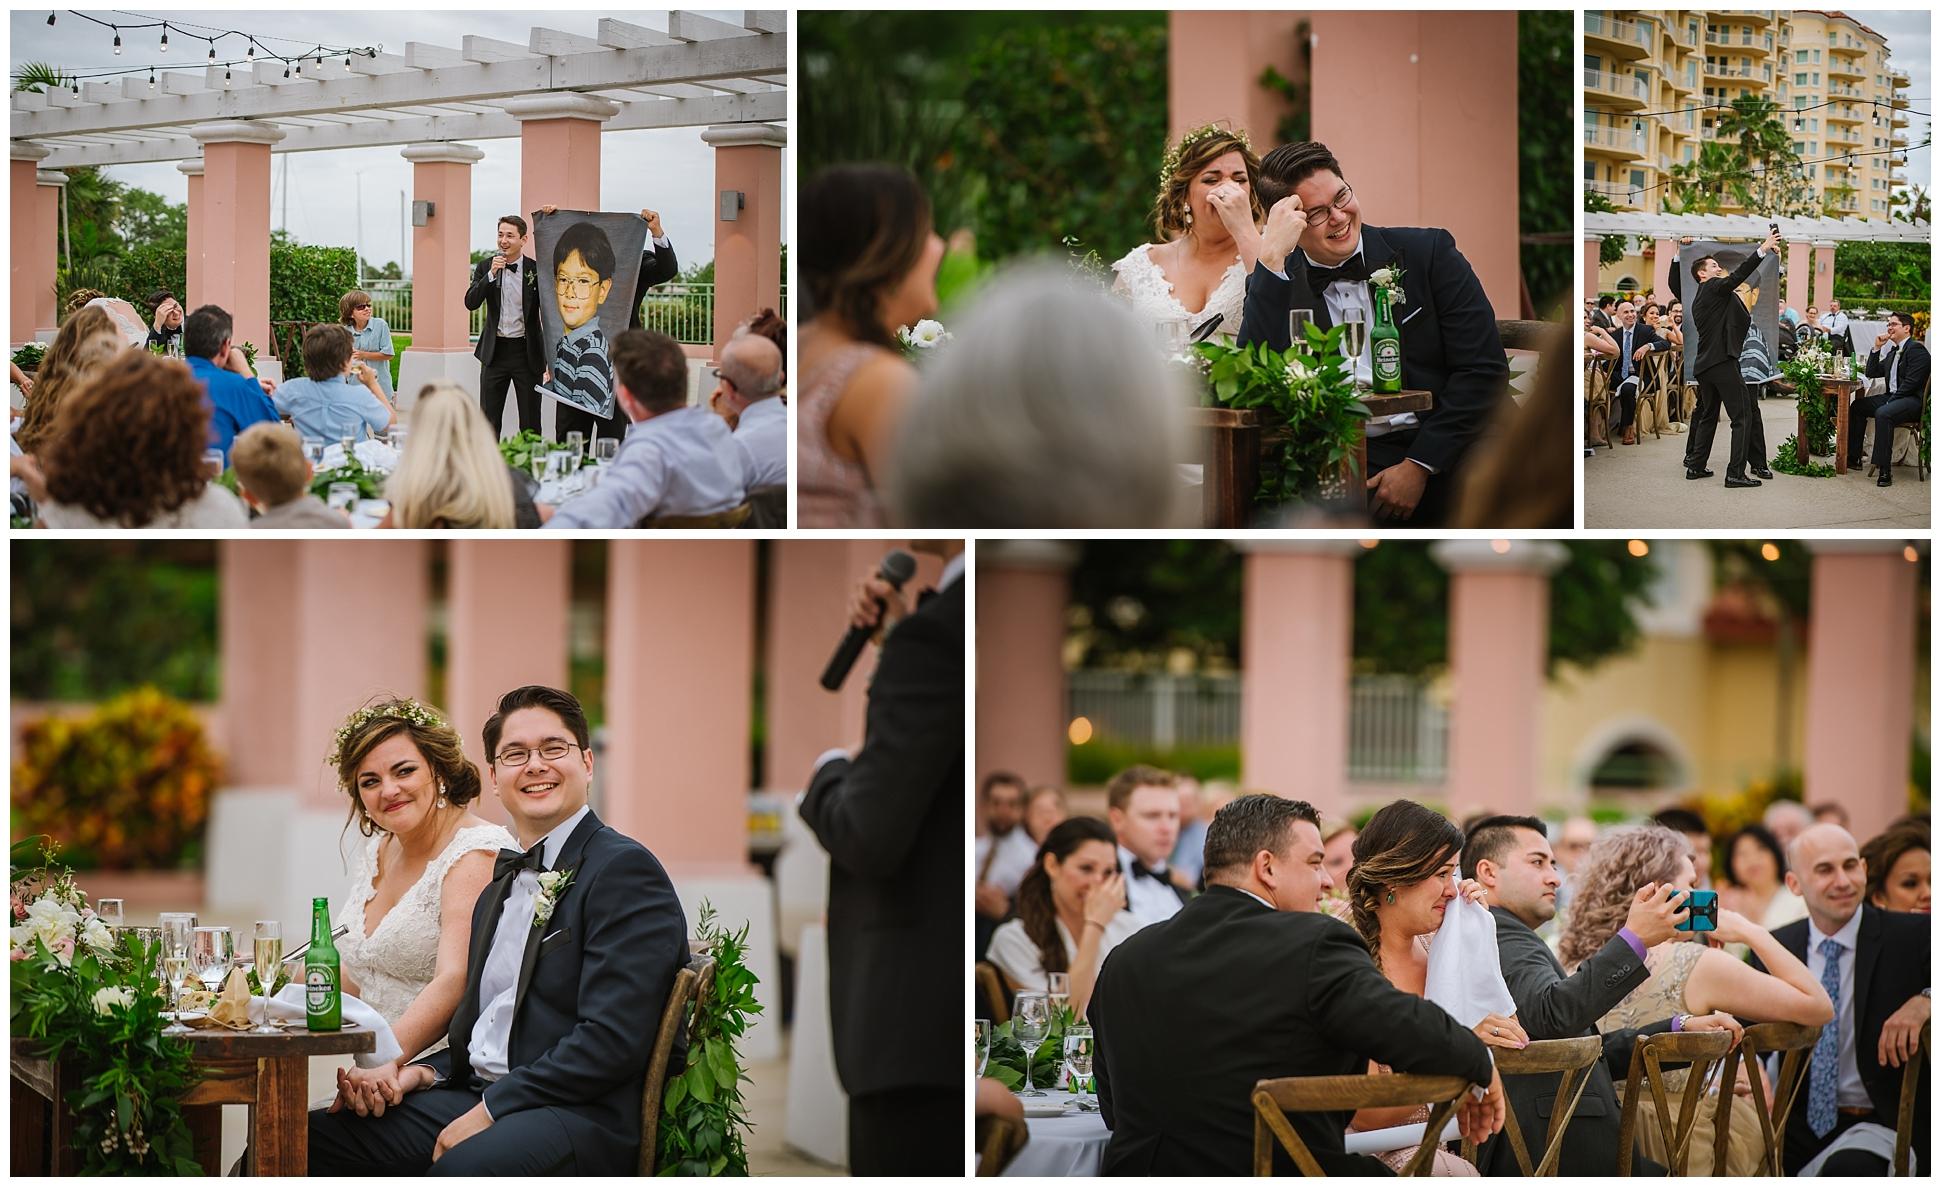 st-pete-wedding-photographer-italian-romance-theme-rustic-flower-crown_0442.jpg